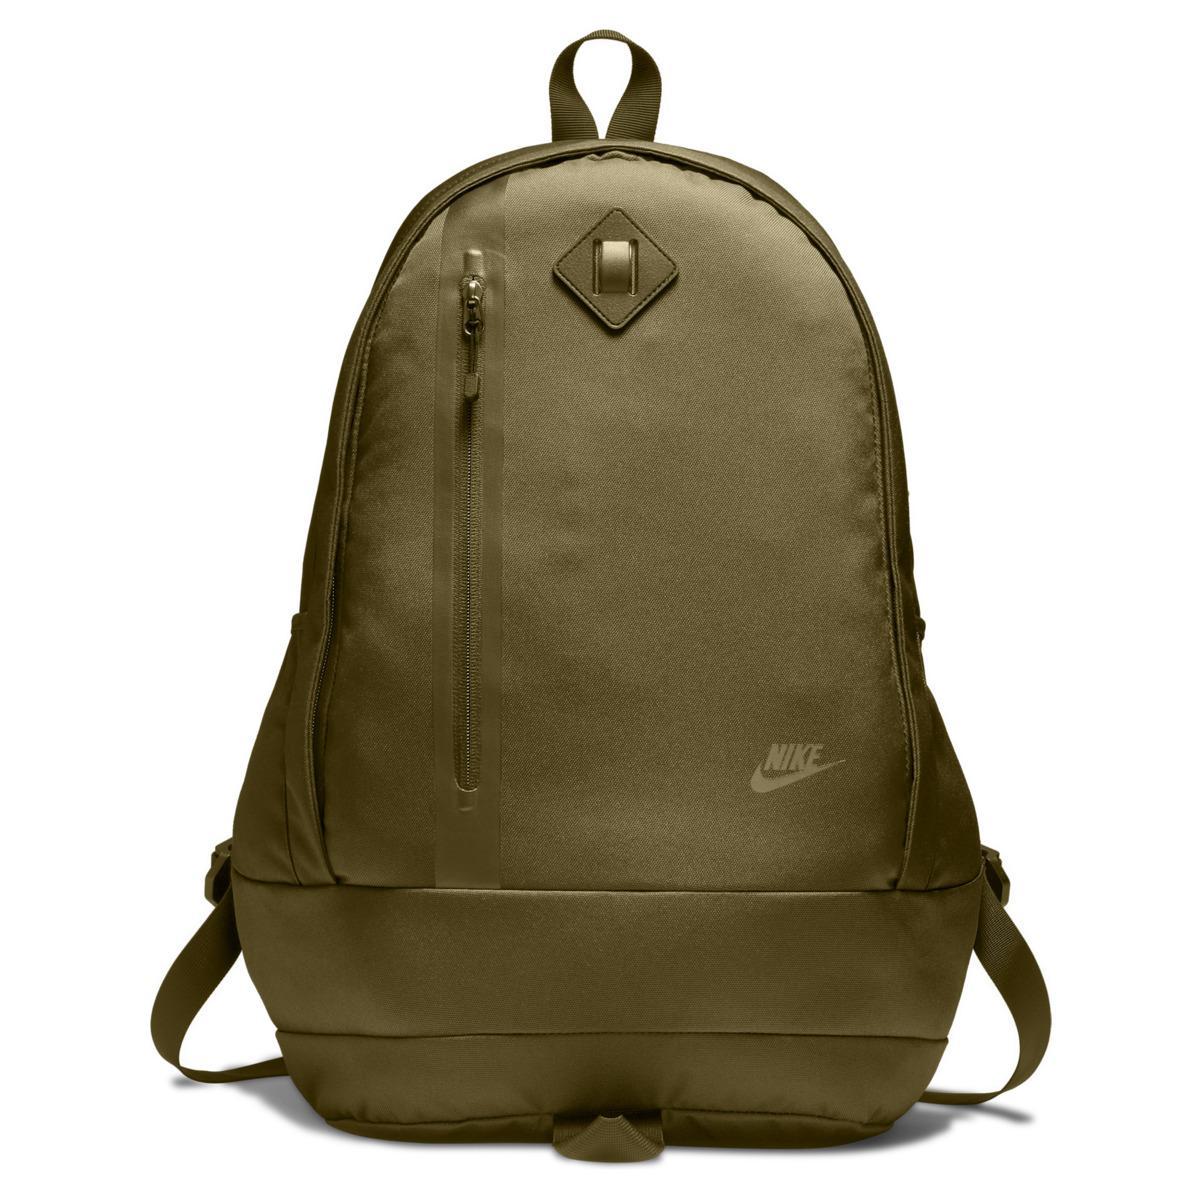 a94b695971 Nike Cheyenne Backpack in Green for Men - Lyst